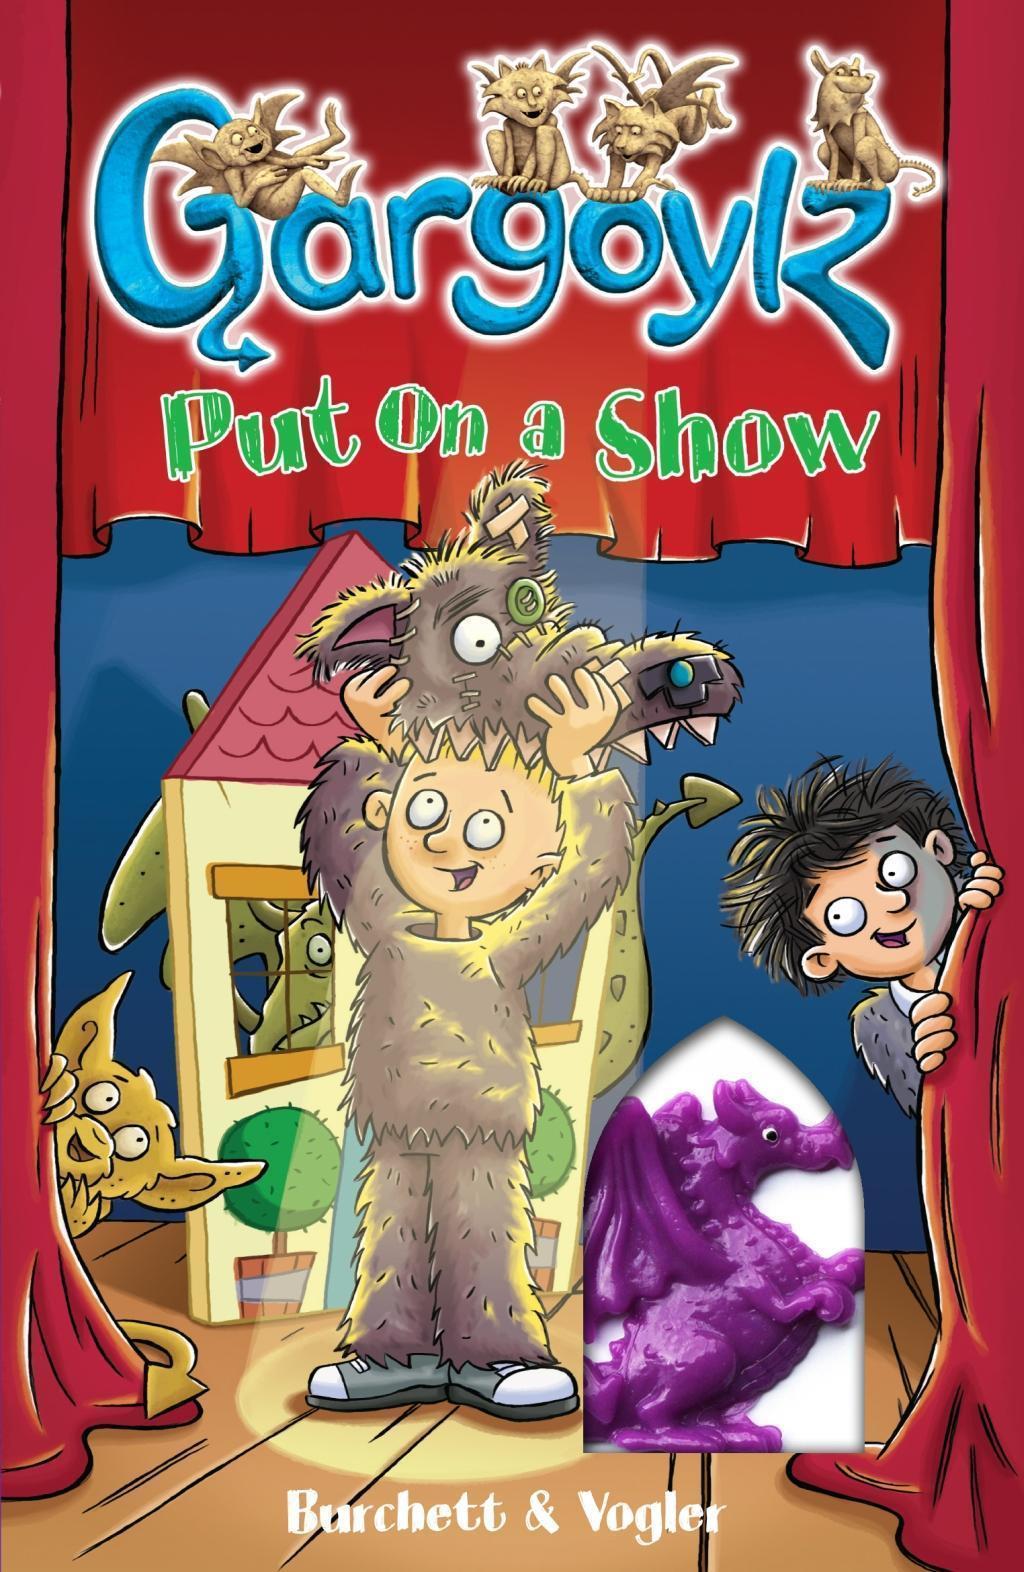 Gargoylz Put On a Show